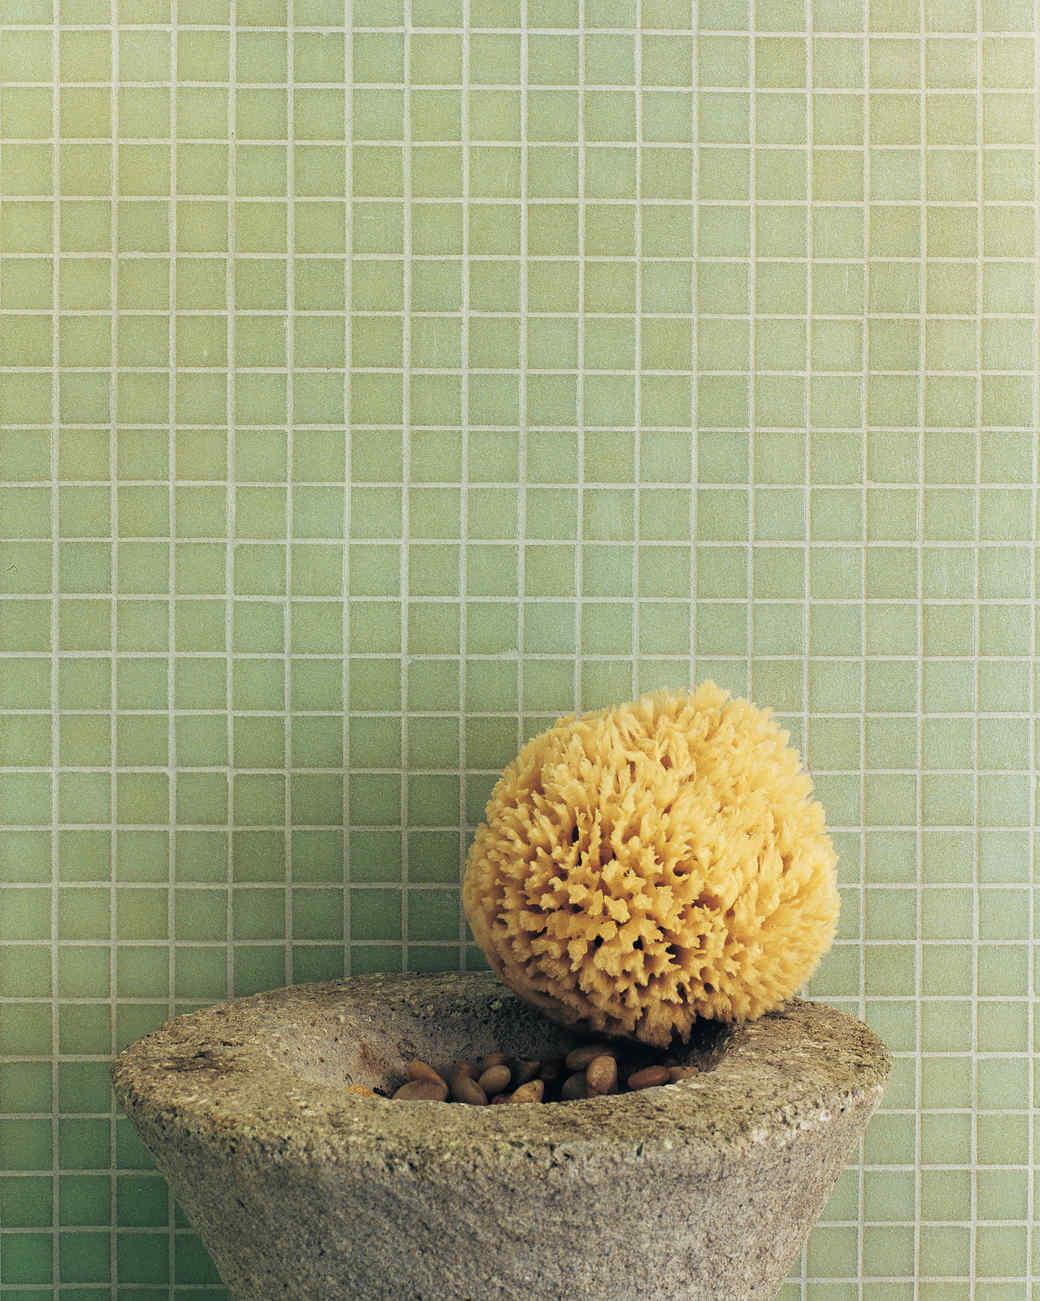 Bathing Beauties: The Simple Ideas Behind 2 Stylish Bathroom Makeovers